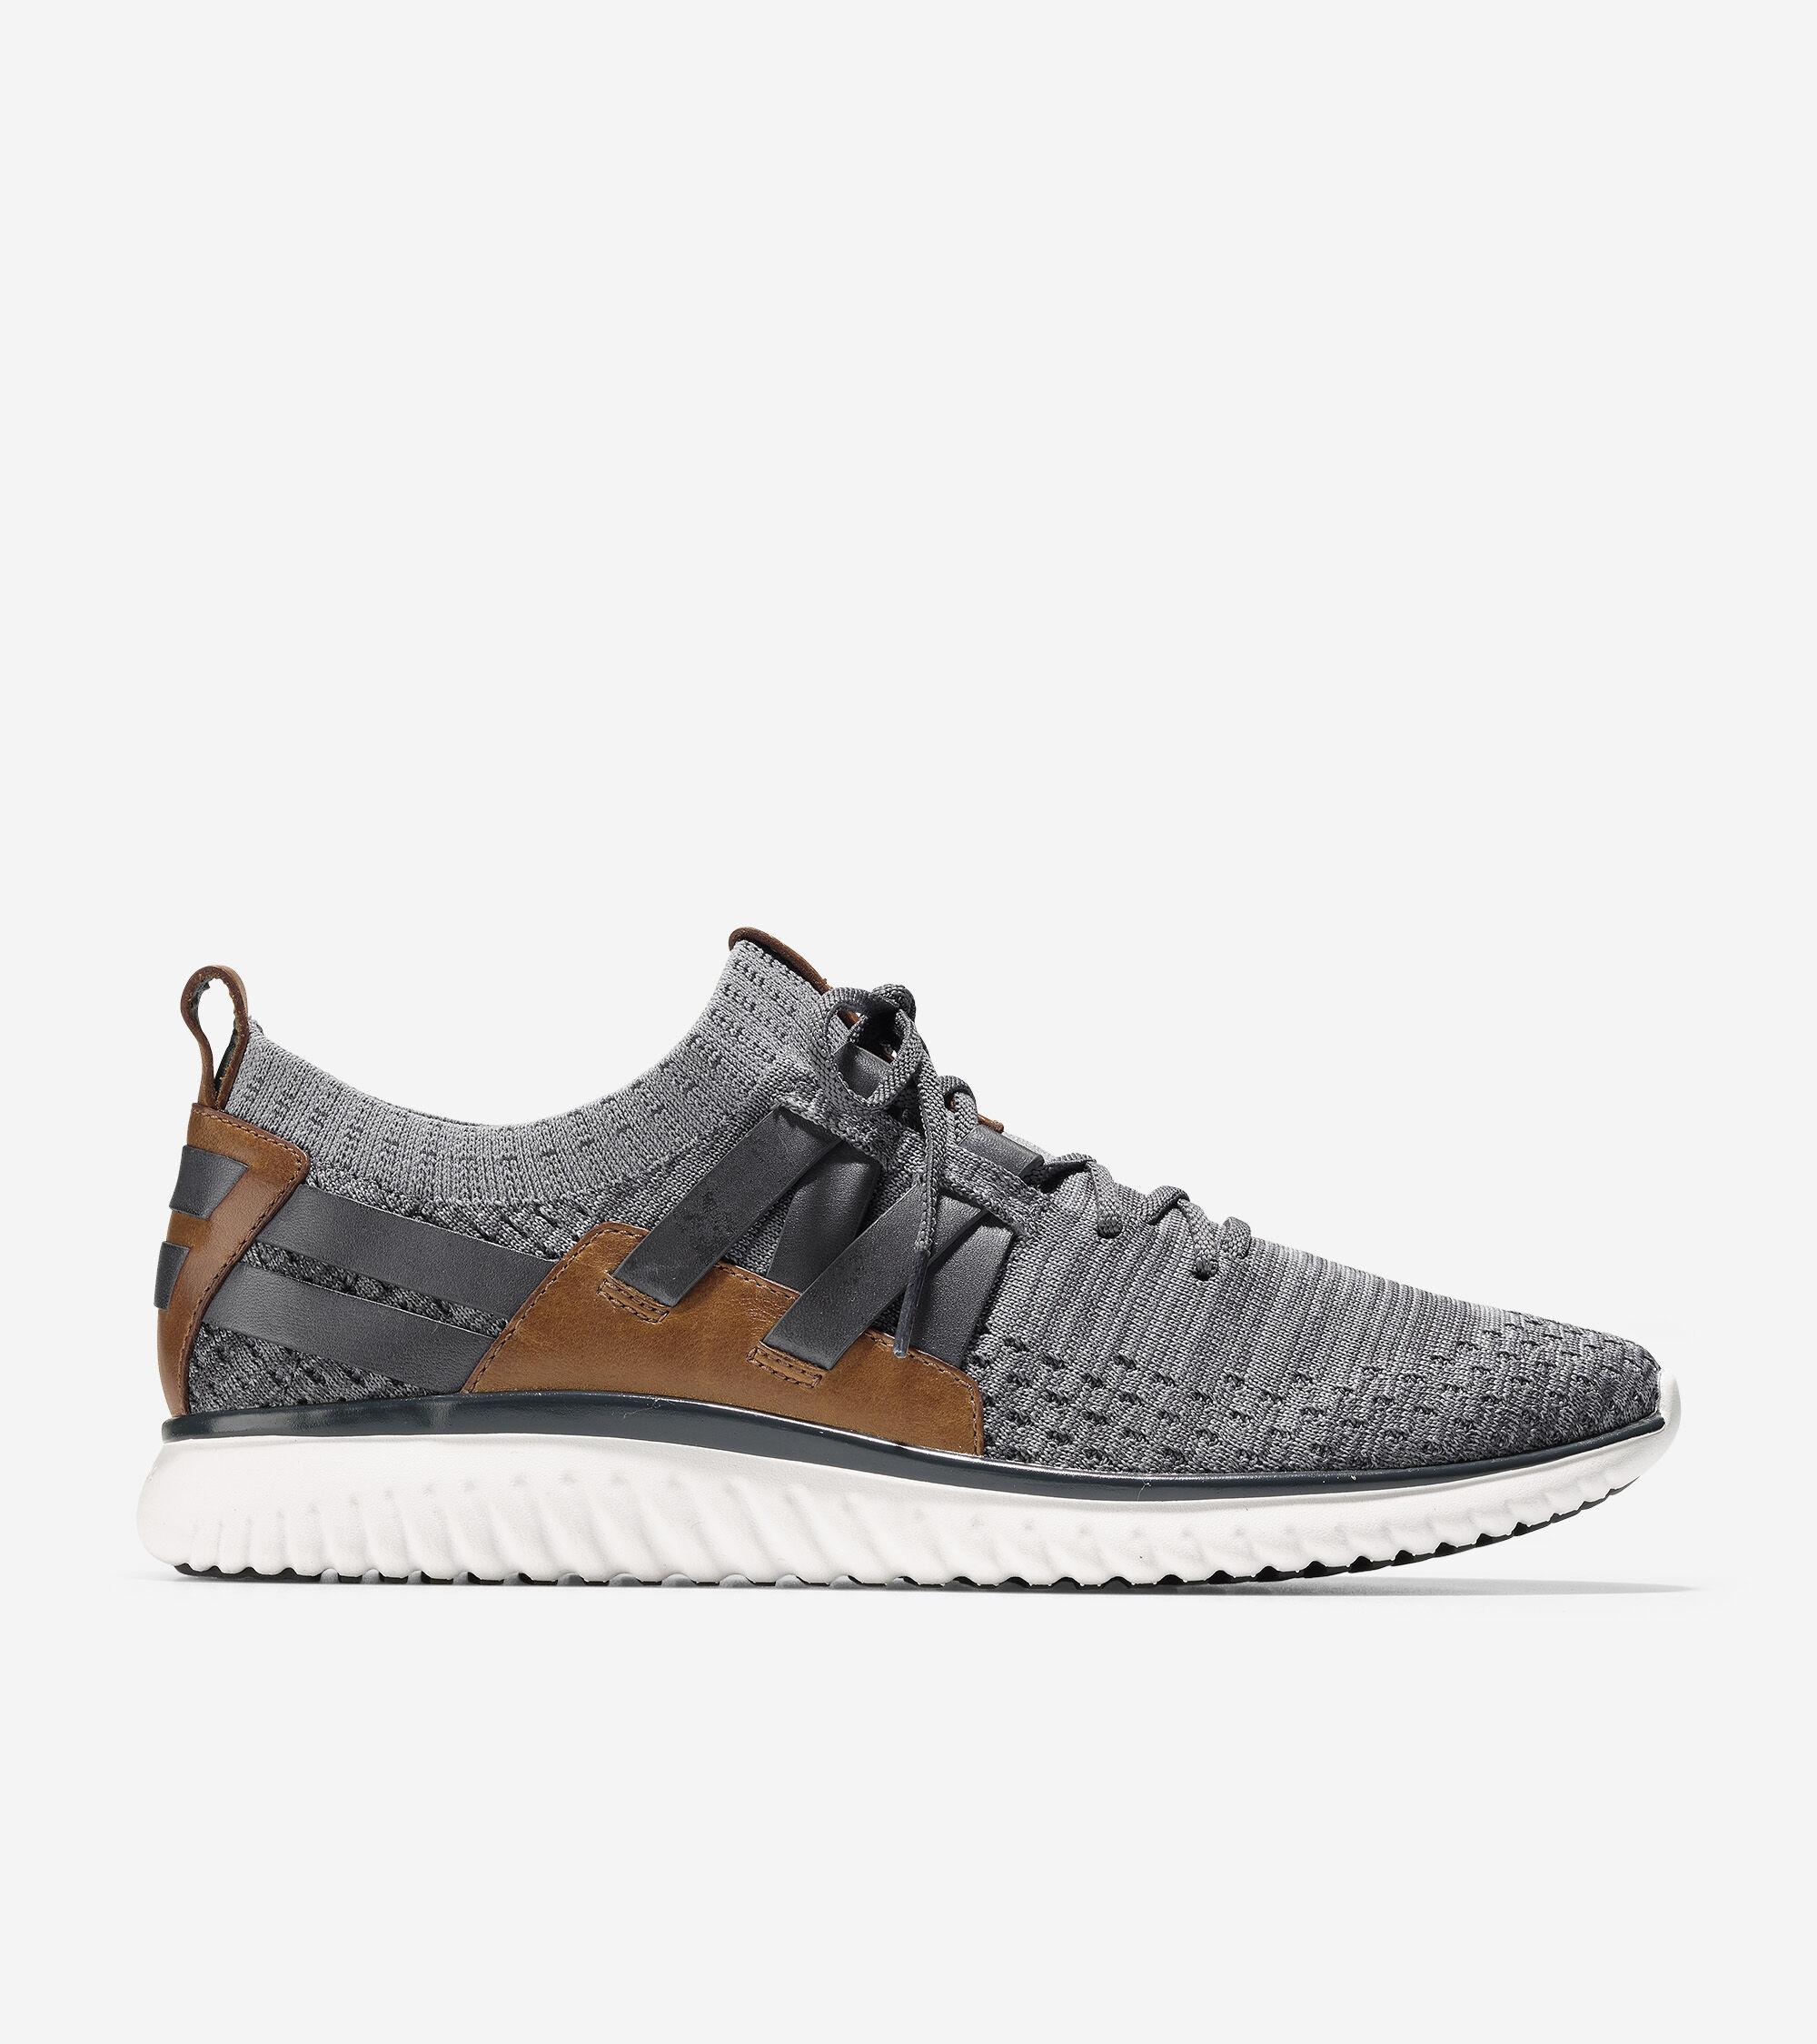 comfortably Blue Green Black Mens Shoes Nike Free Run 2